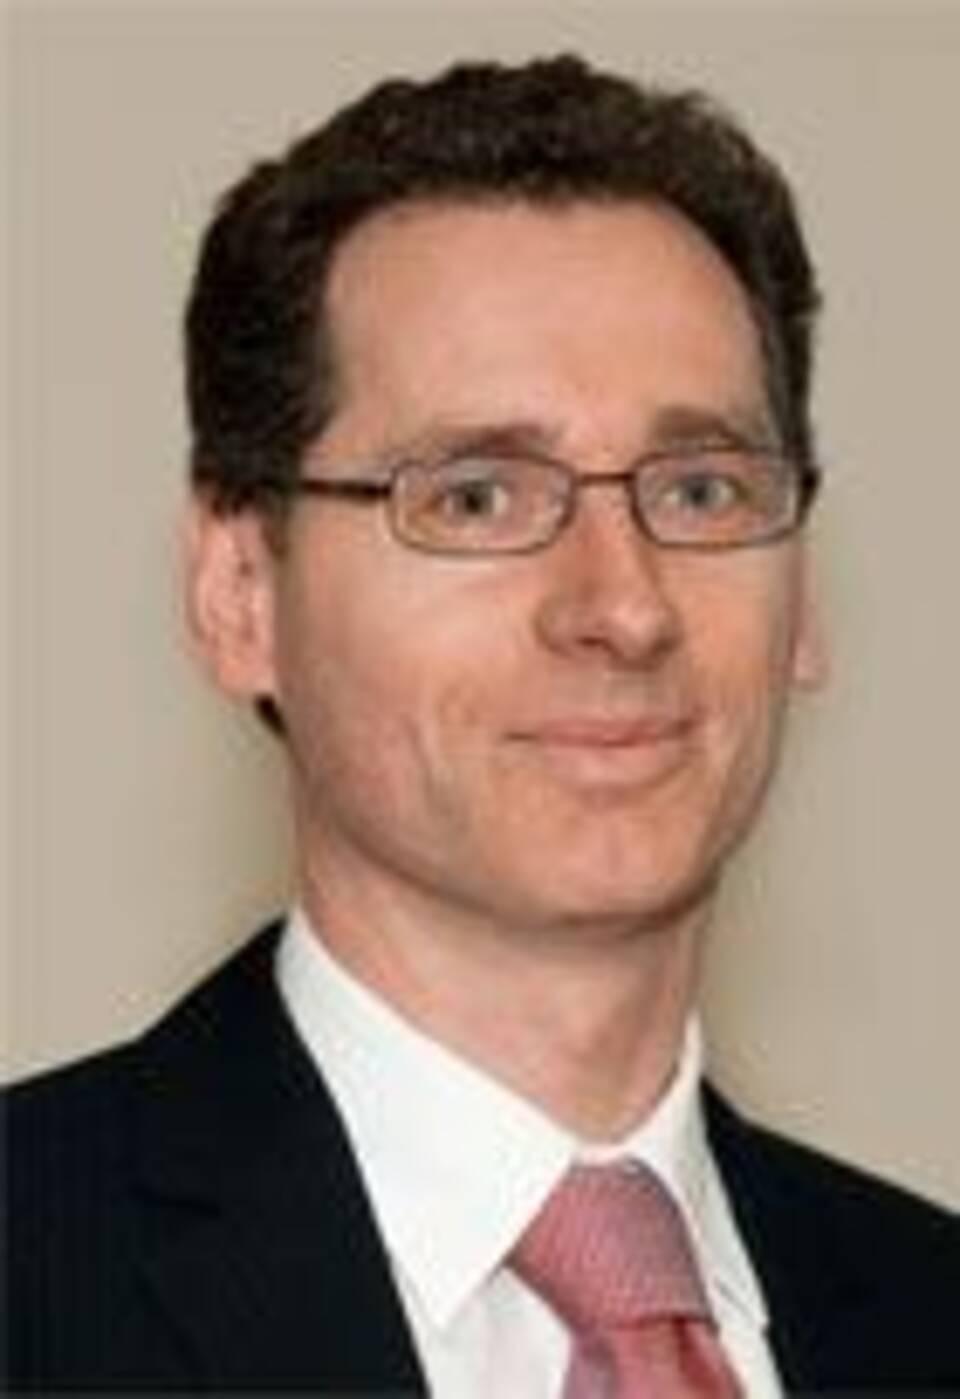 PD Dr. Severin Daum